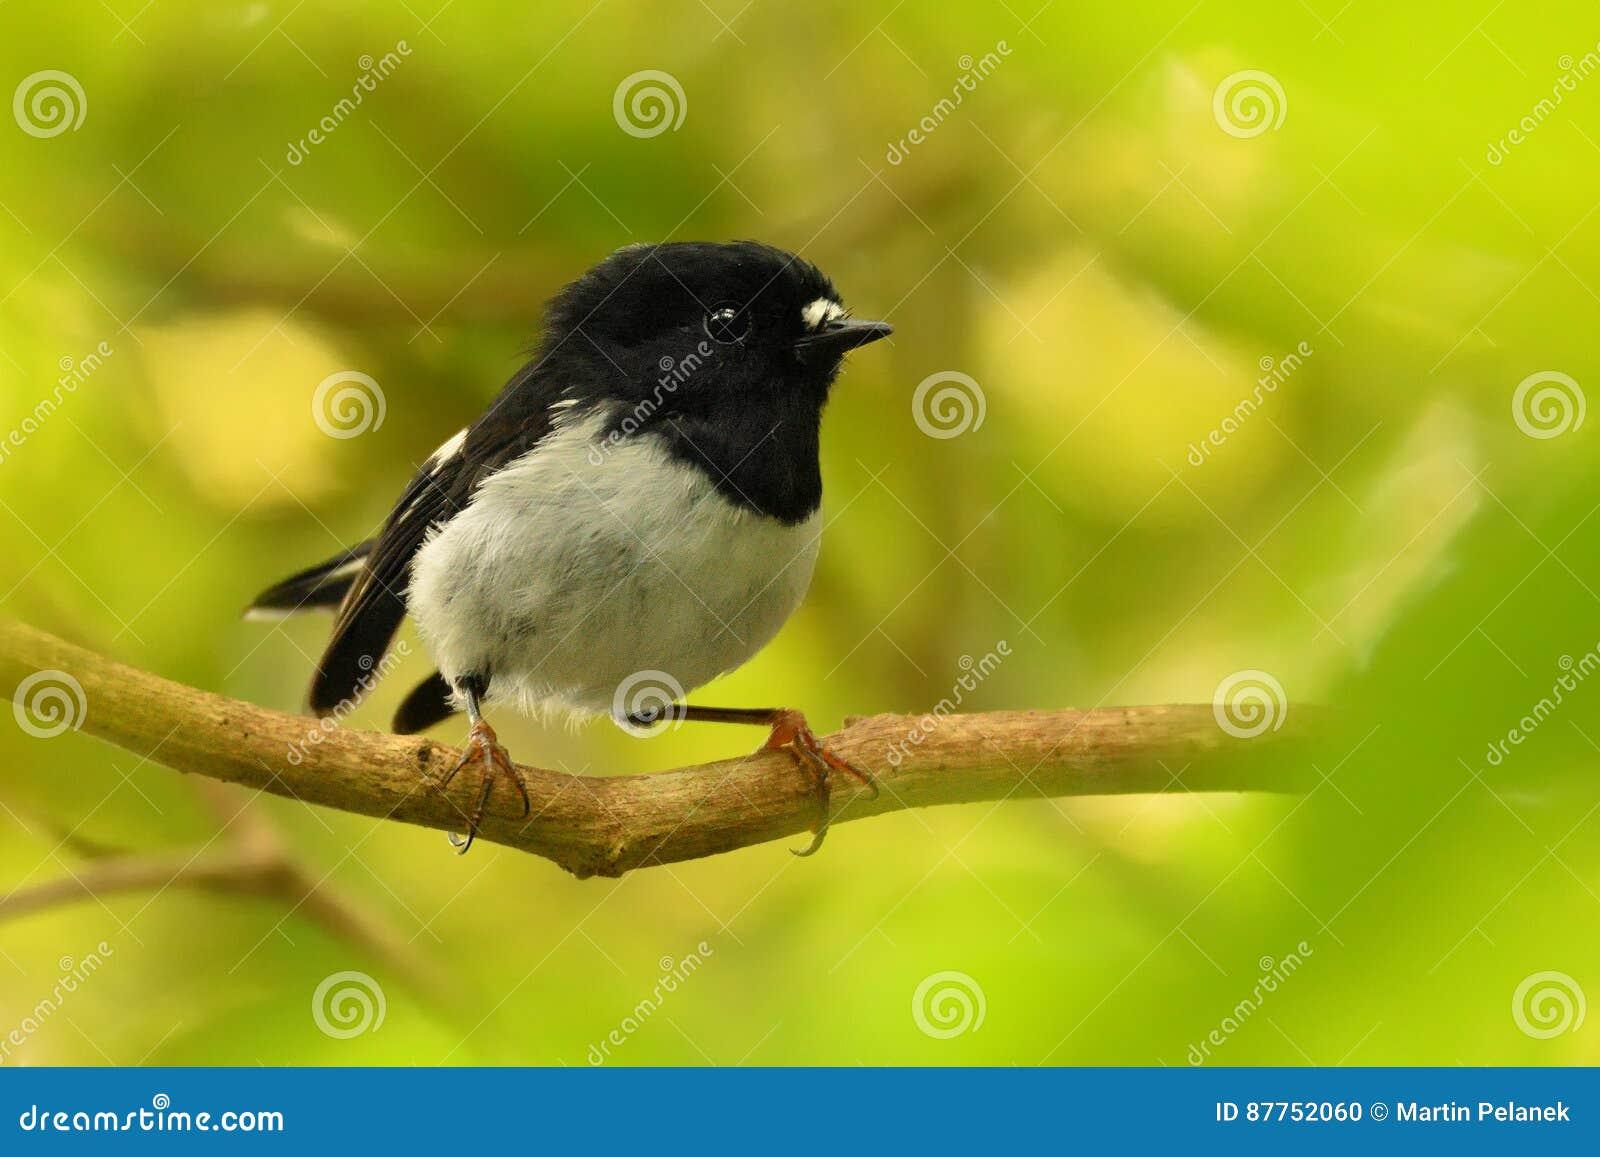 Petroica macrocephala toitoi -北岛Tomtit - miromiro -地方性新西兰森林鸟